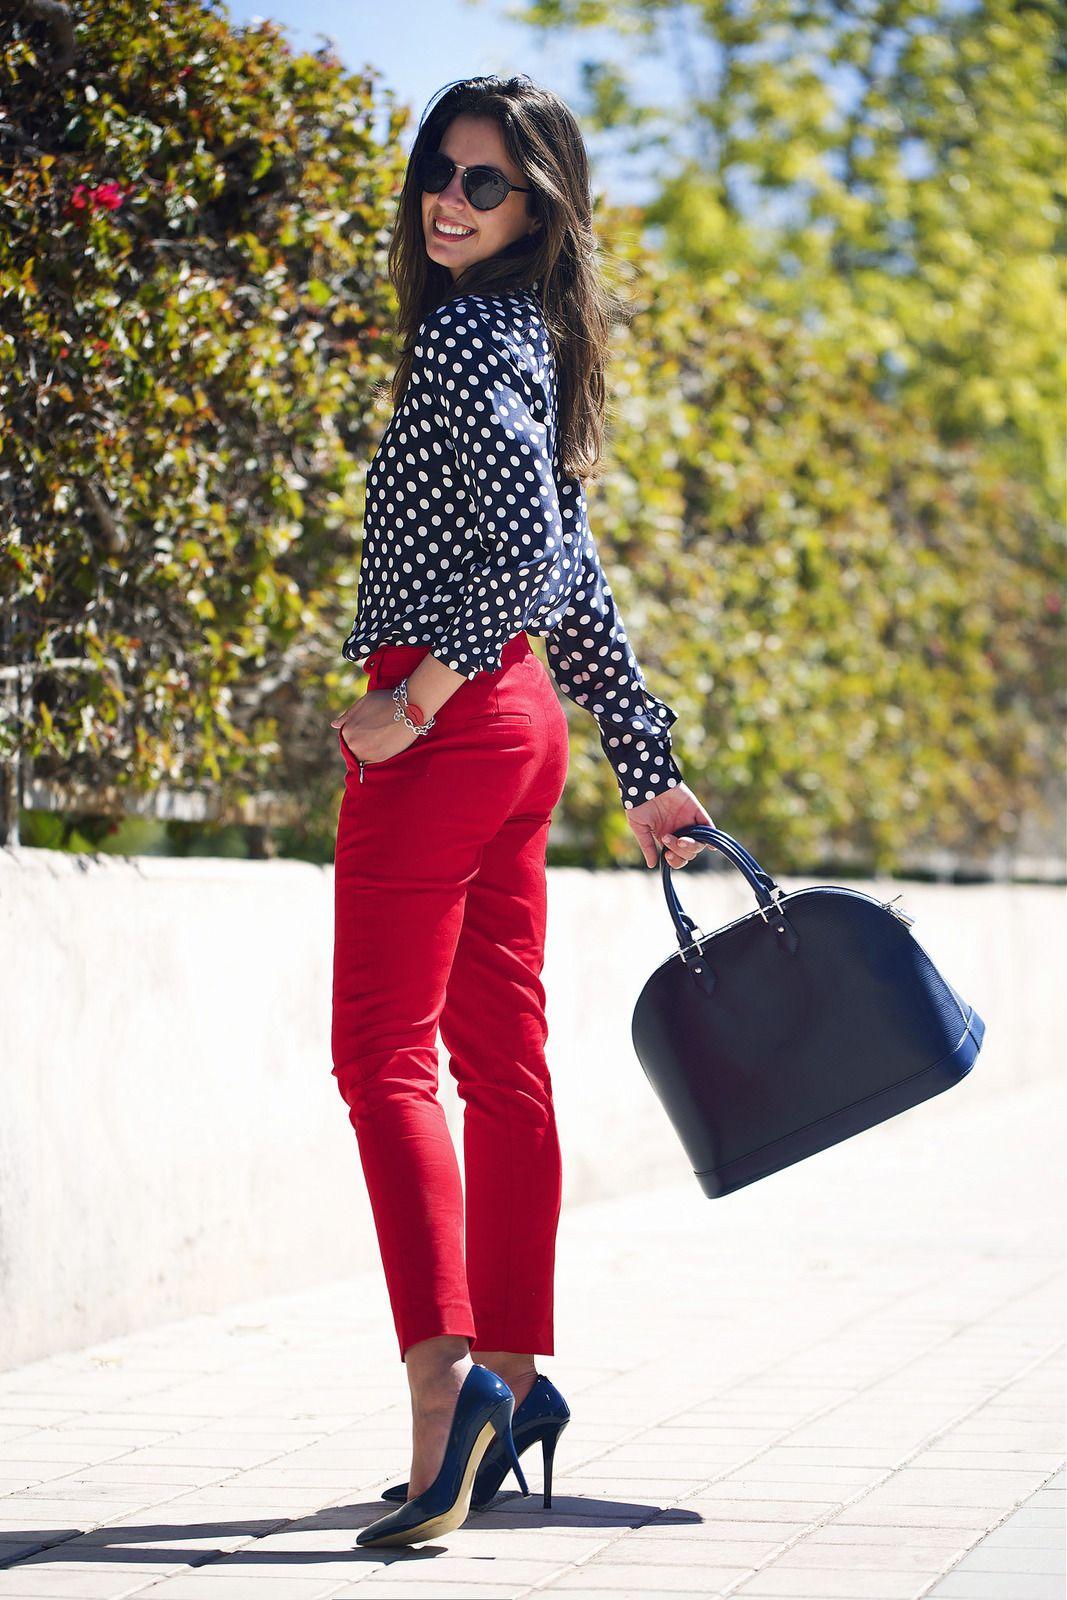 _71B0458 | Ropa de moda, Moda rojo, Moda